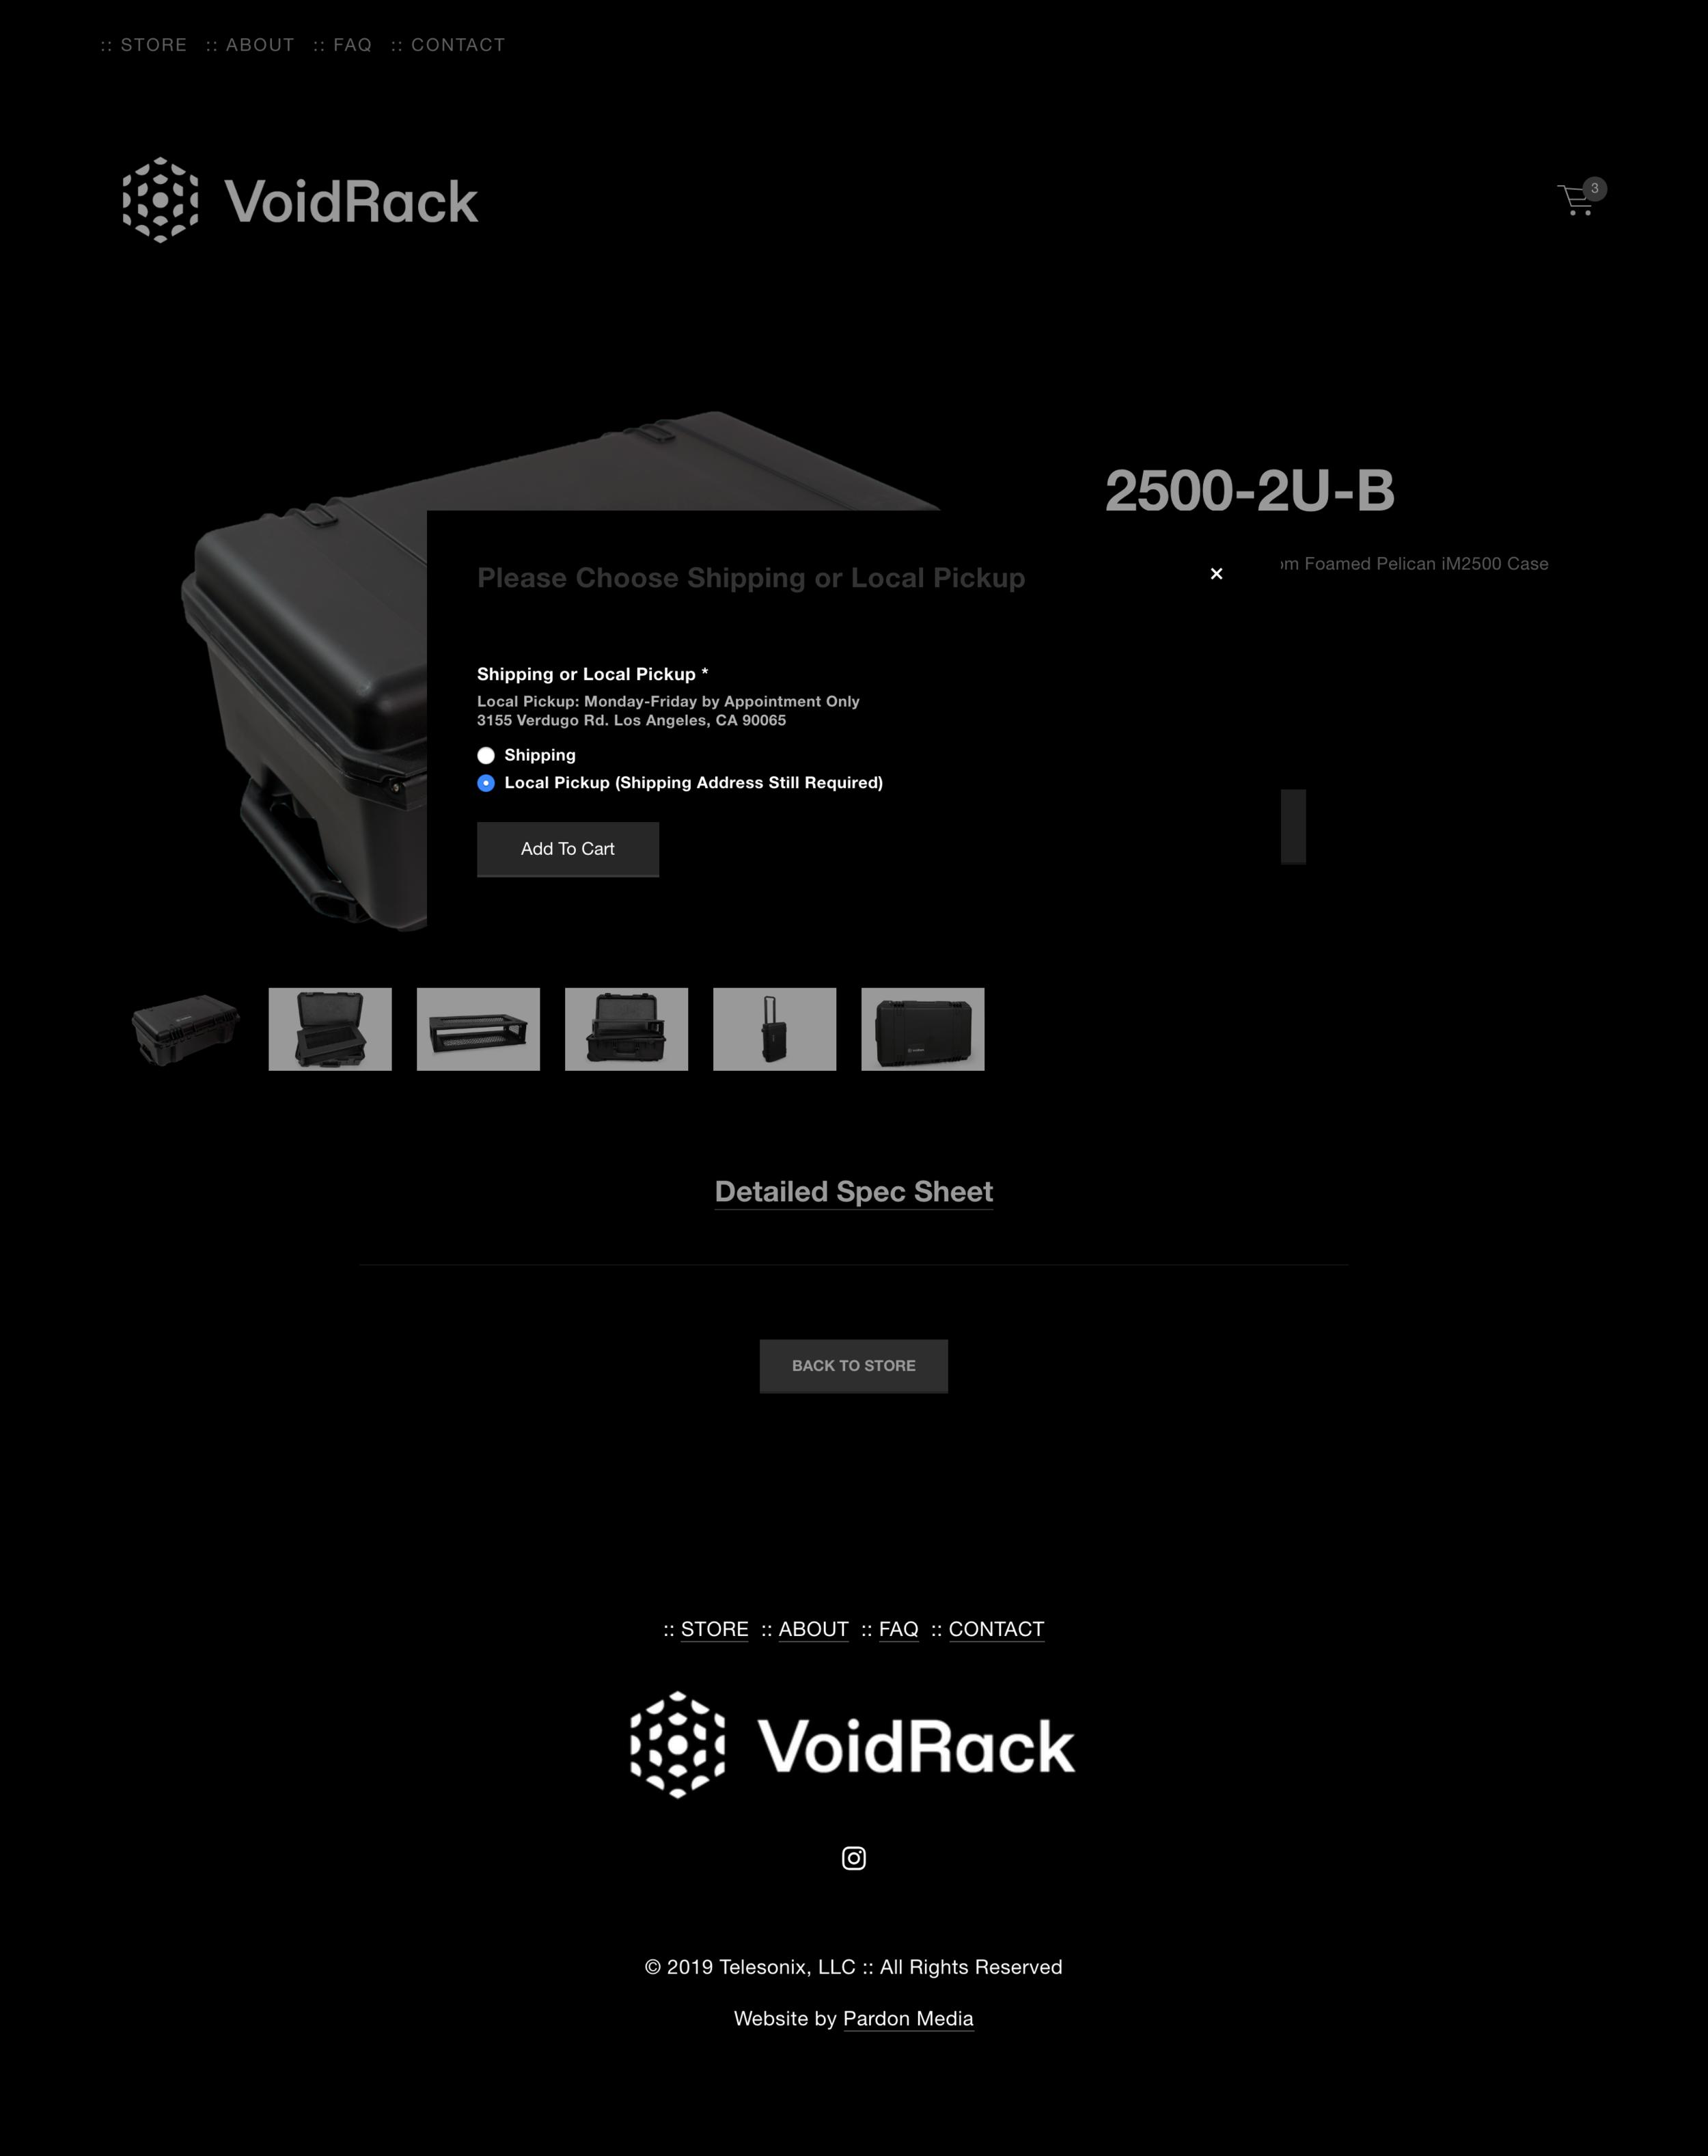 screencapture-voidrack-shop-voidrack-2500-2u-b-2018-12-23-21_16_53.png